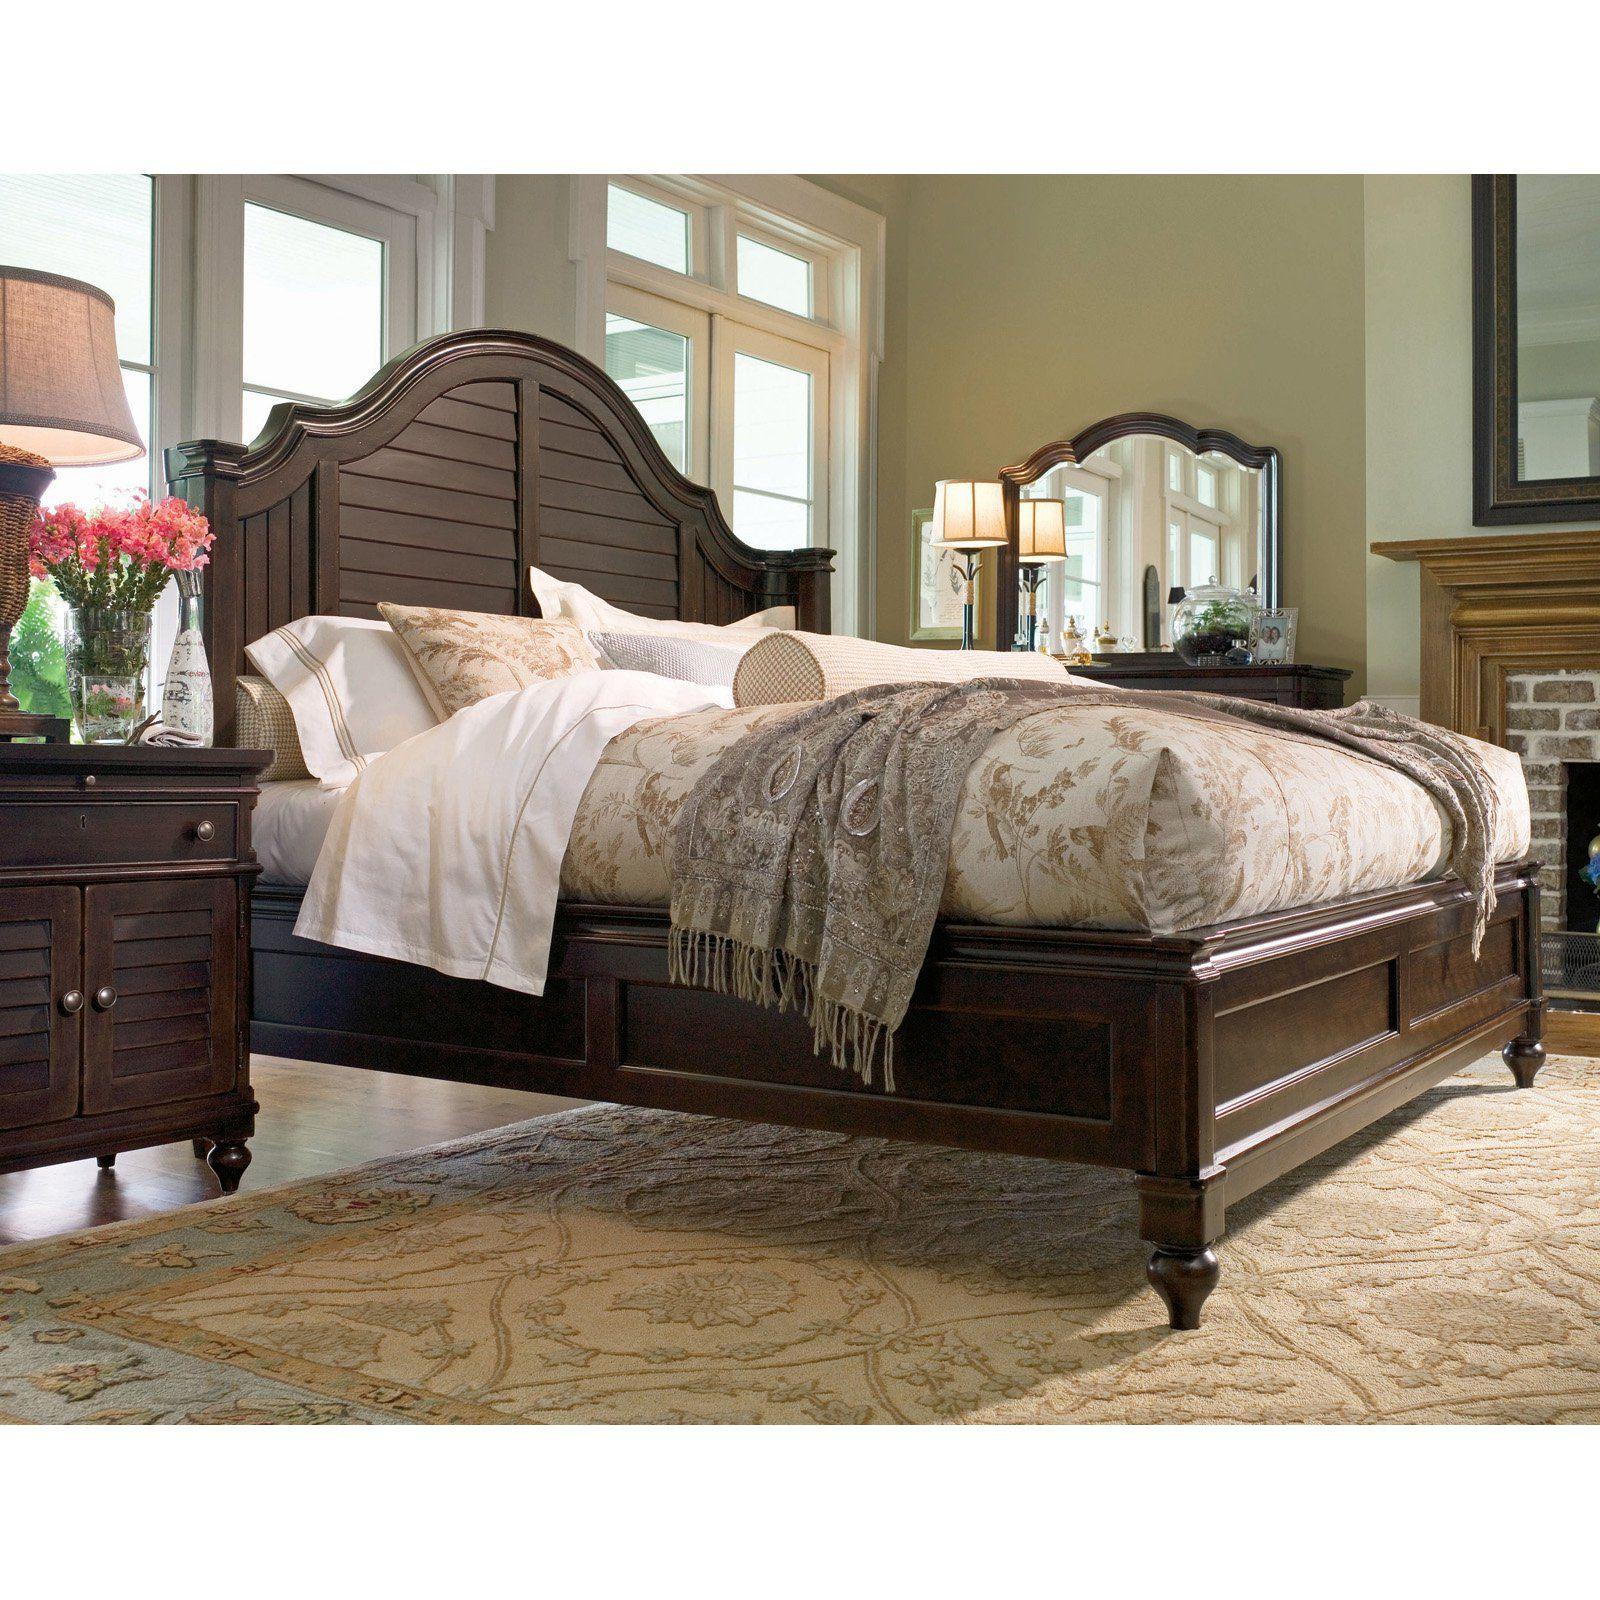 Paula Deen Home Steel Magnolia Mansion Panel Bed, Size: Queen